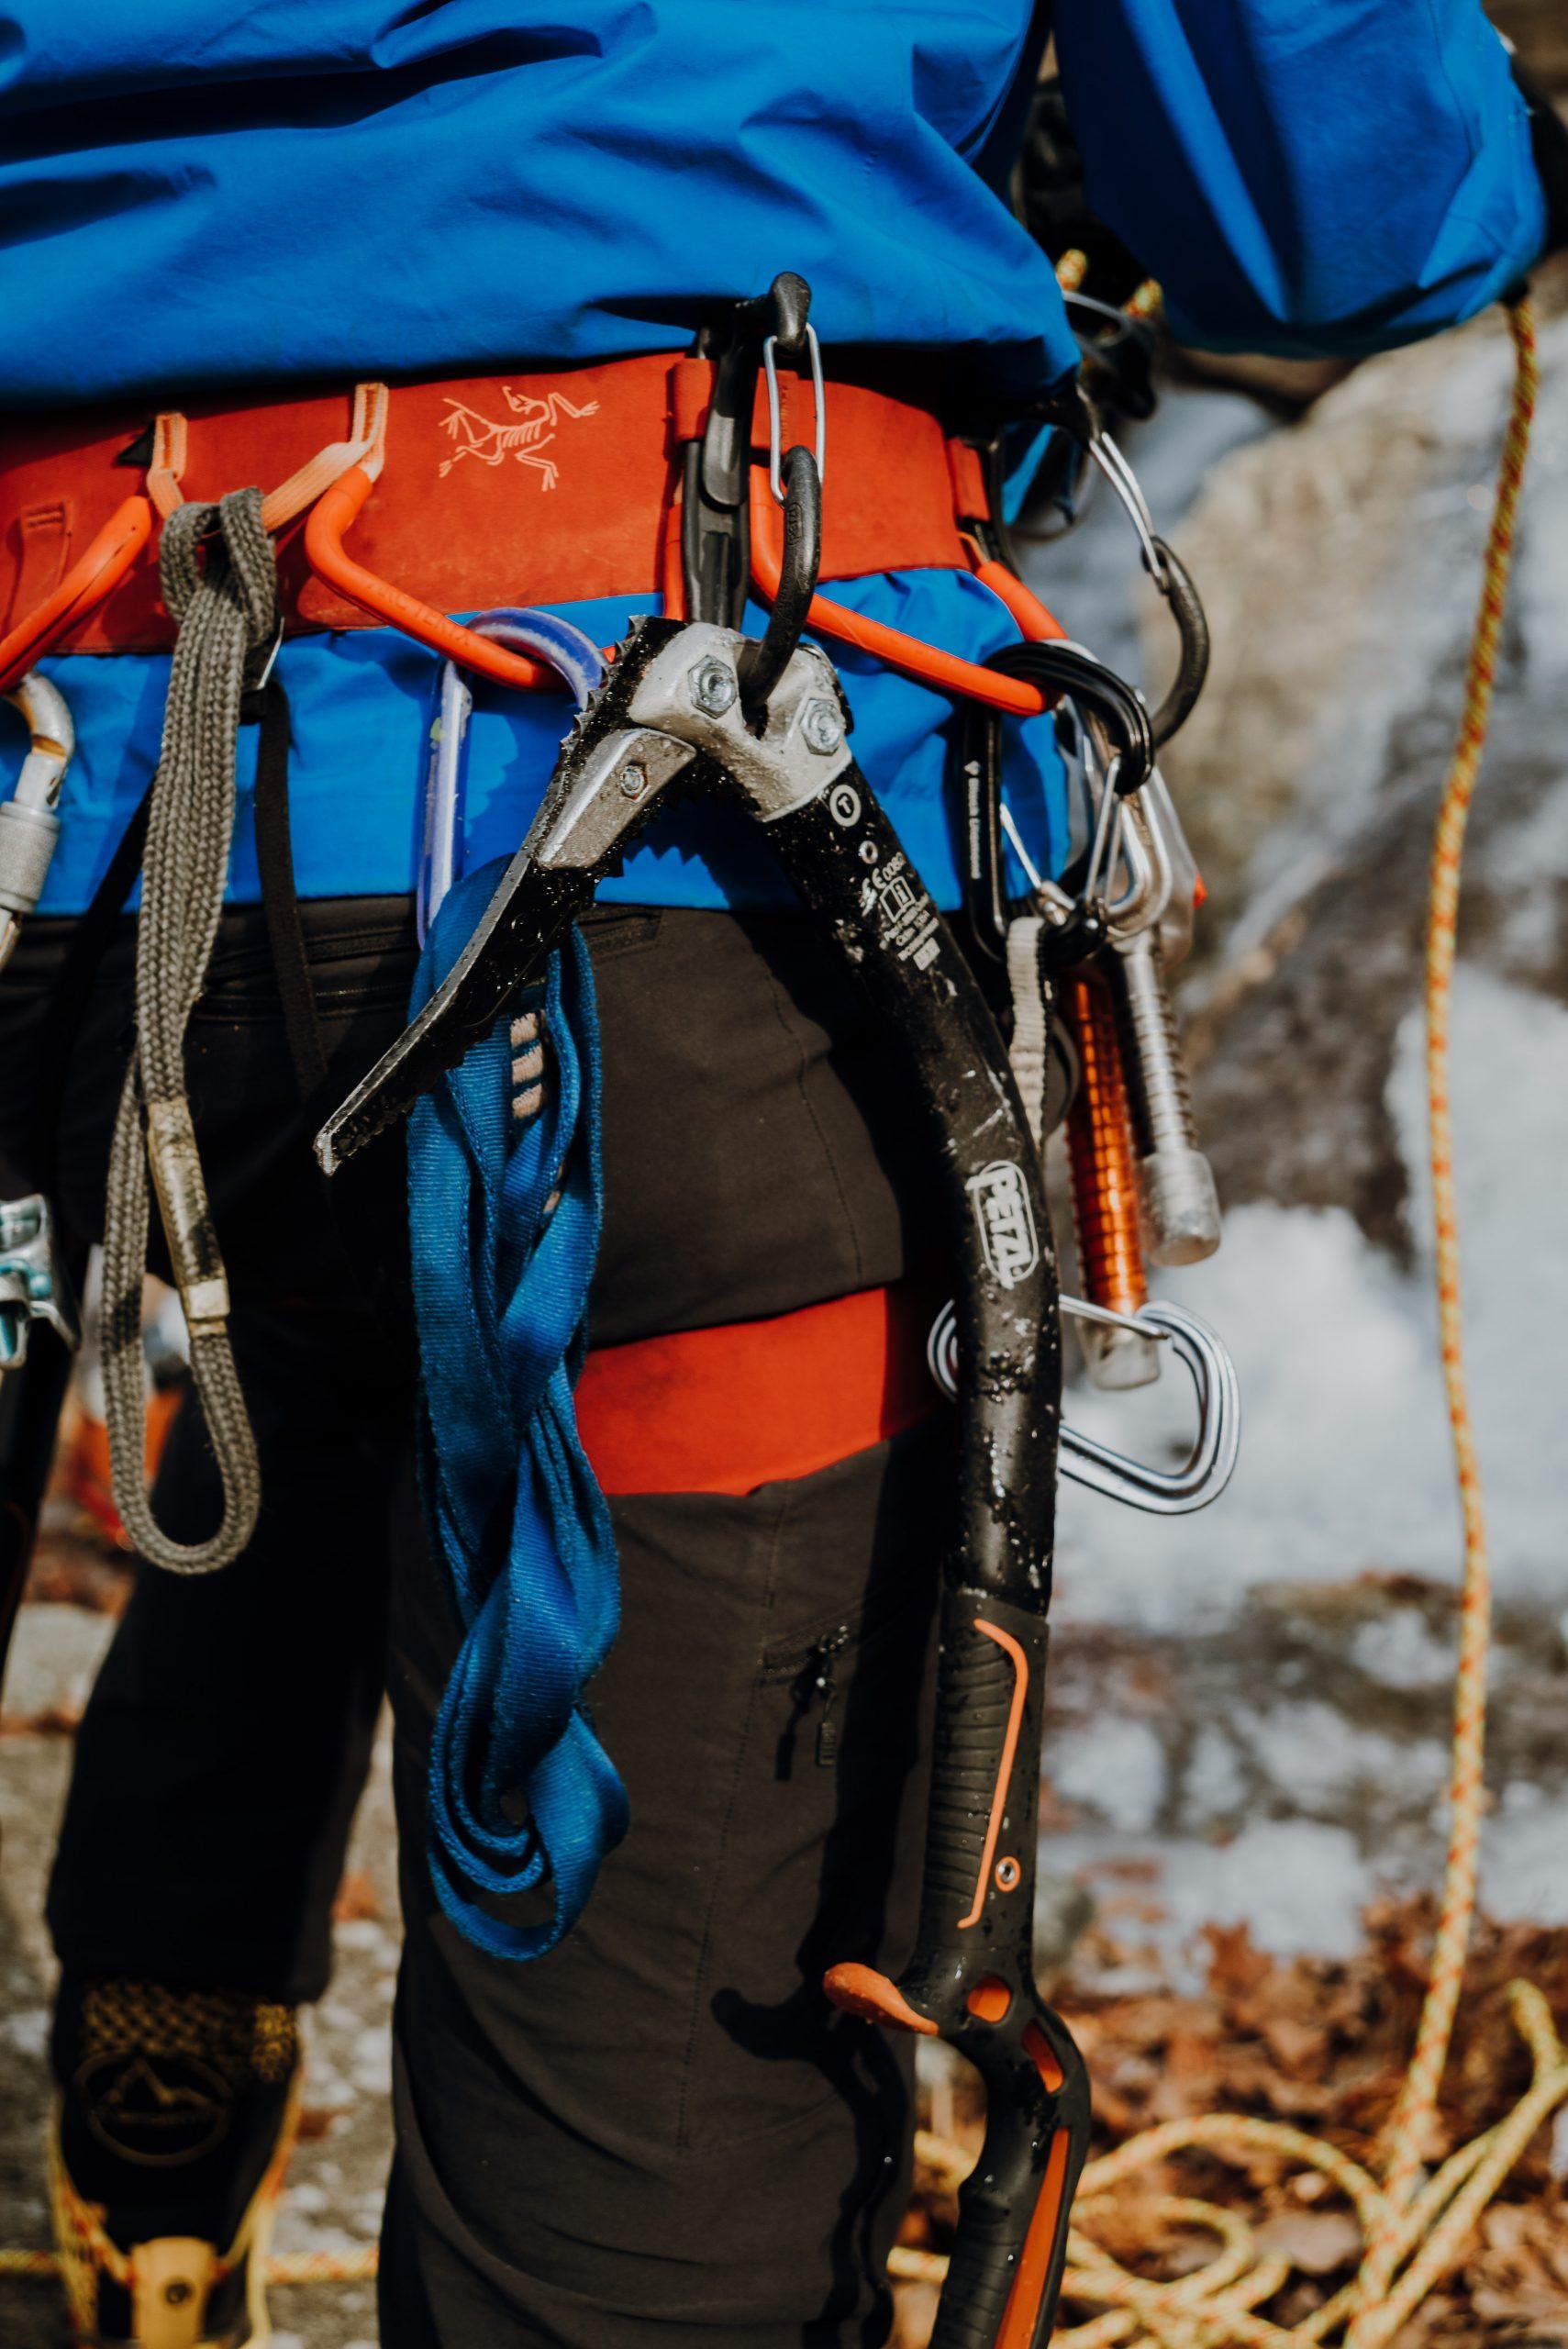 Ice Climbing equipment